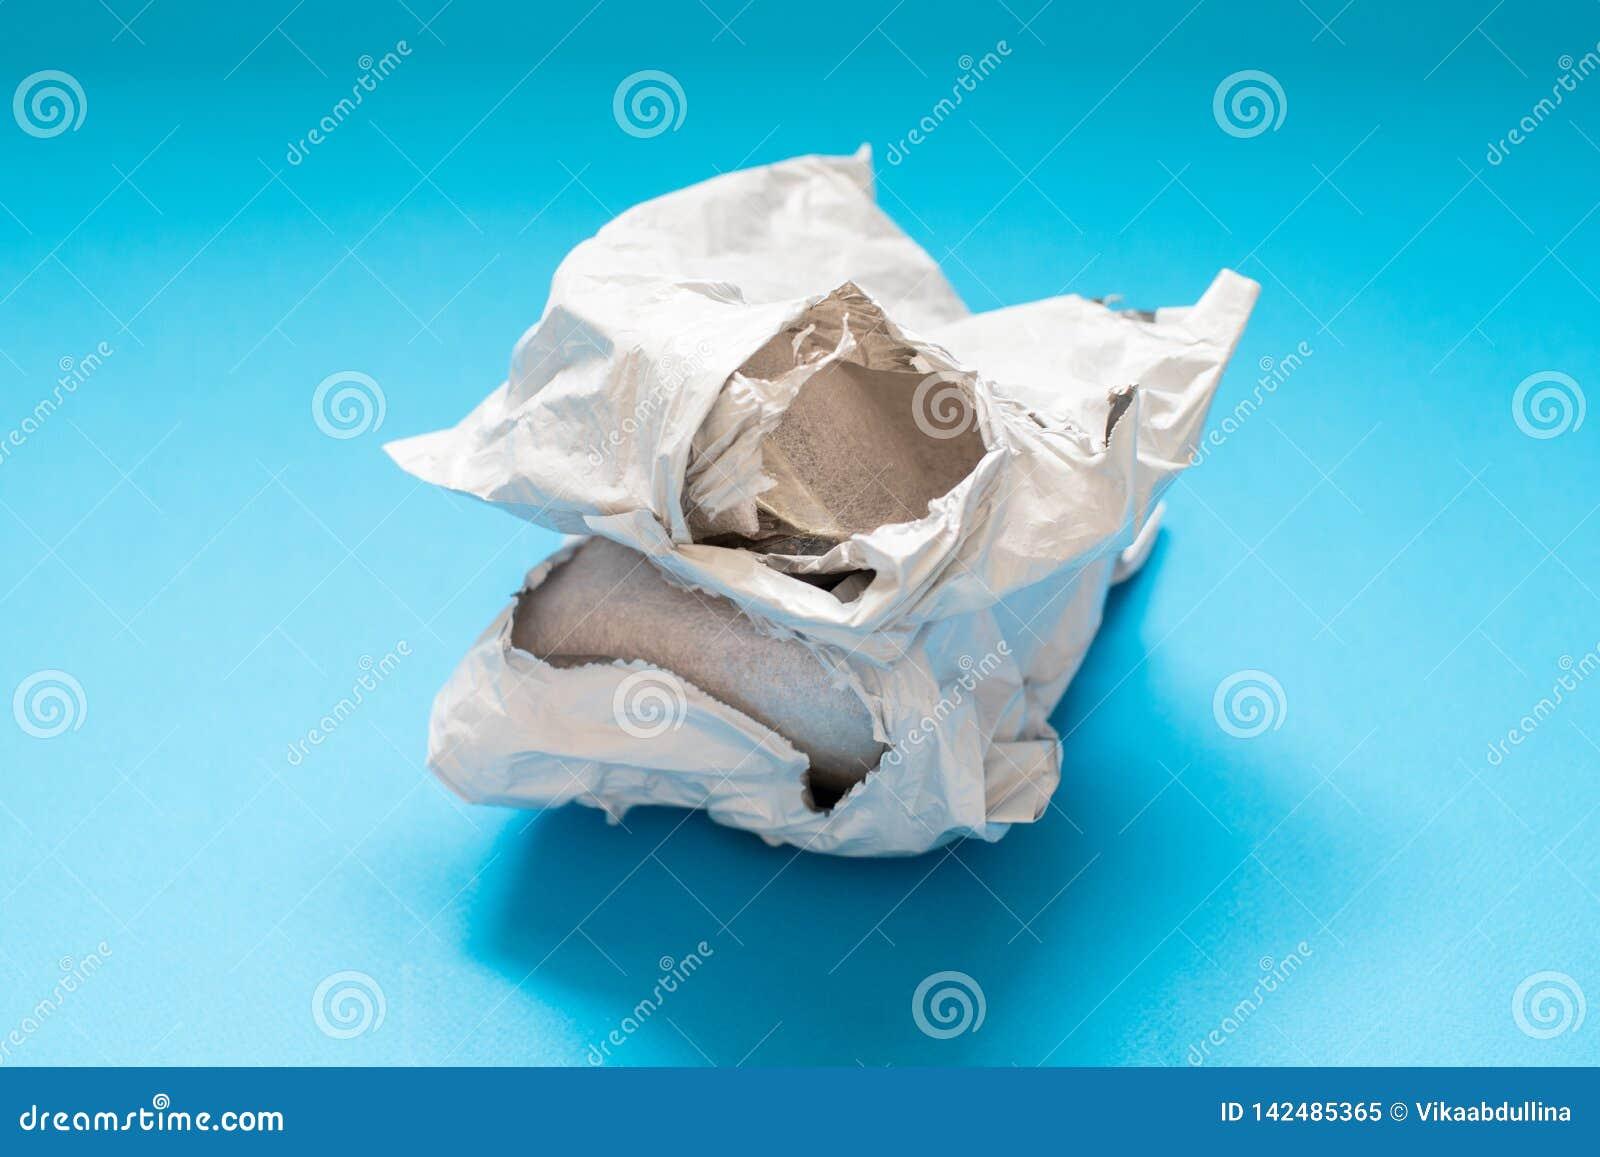 Damaged polyethylene envelope on blue background. Plastic Postal Mailing Bags